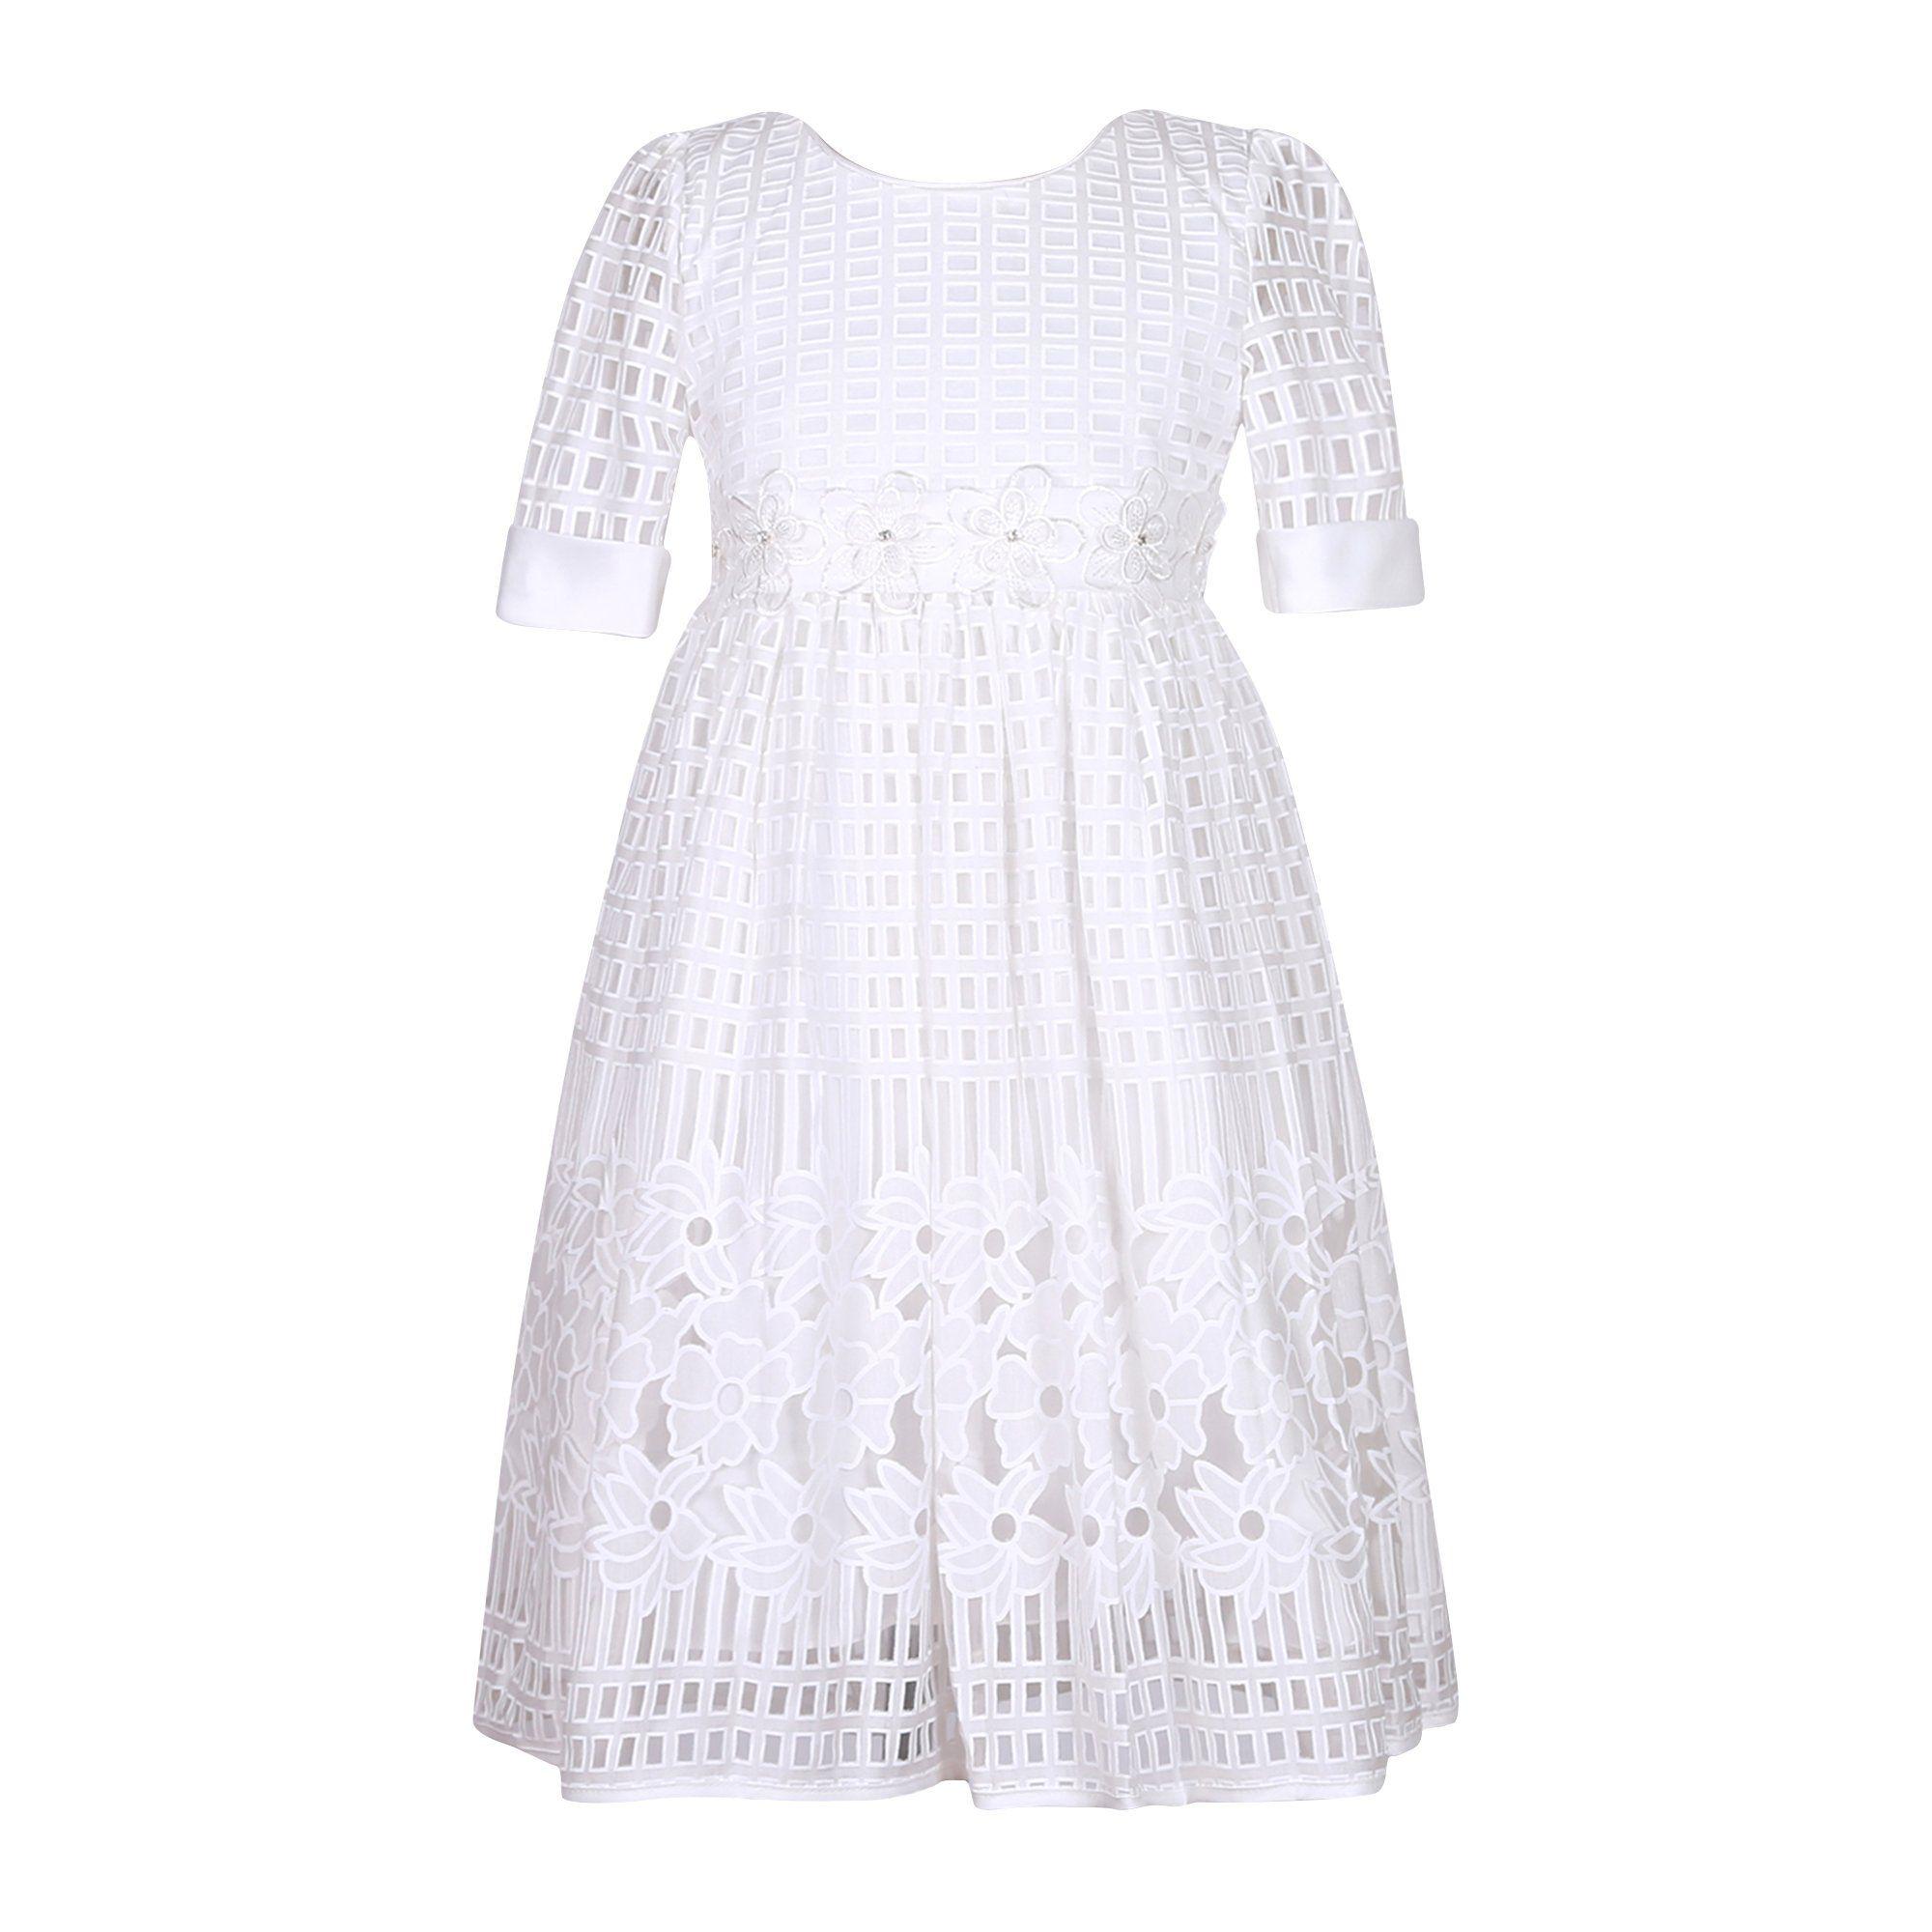 Richie house girlsu princess solid dress with belt rhb